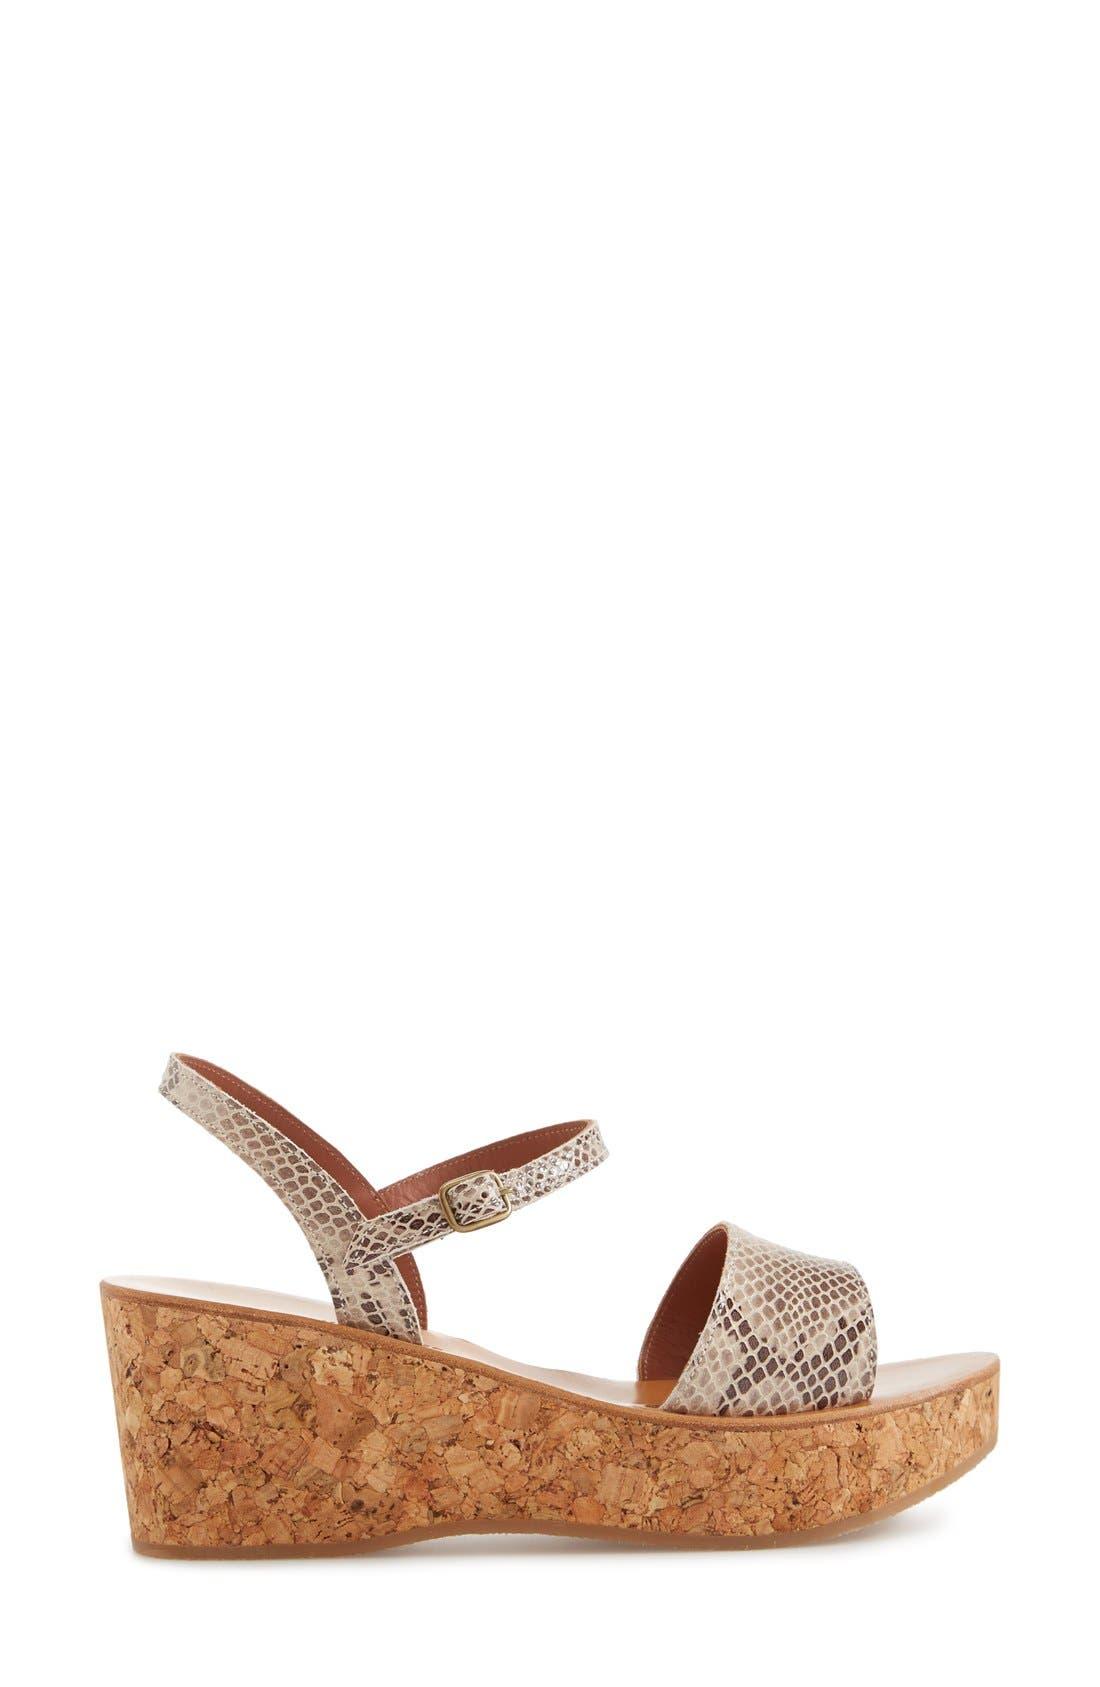 Alternate Image 4  - K.Jacques St. Tropez 'Josy' Ankle Strap Wedge Sandal (Women)